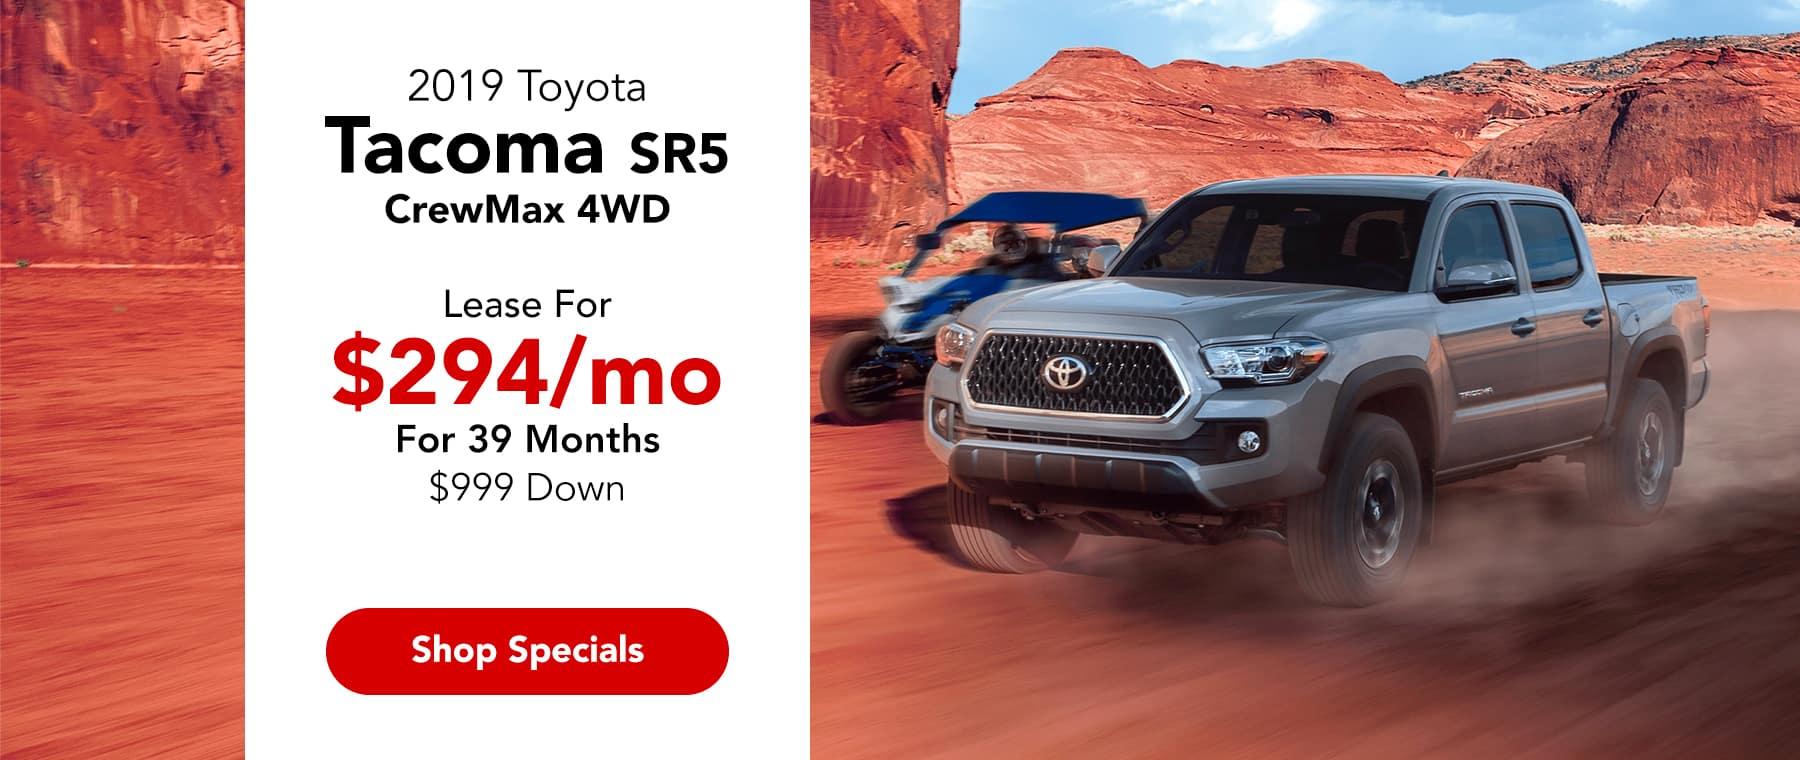 2019 Toyota Tacoma SR5 CrewMax 4WD